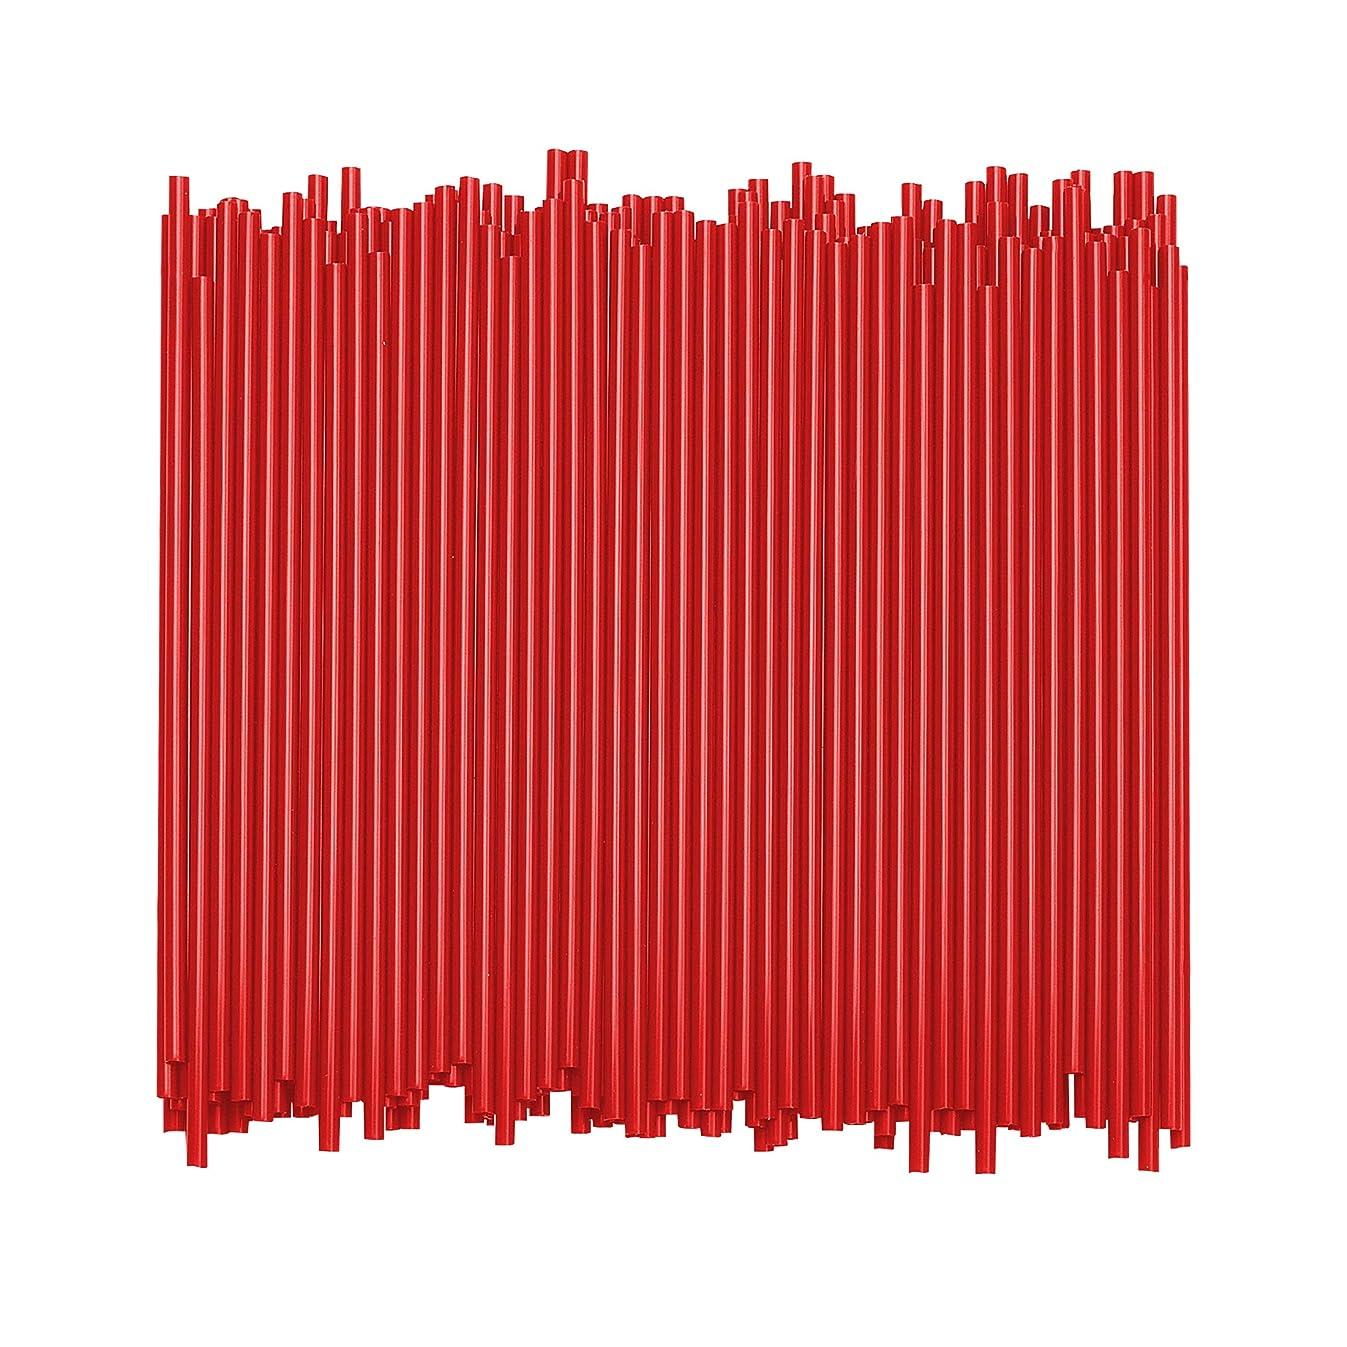 Disposable Plastic Coffee Stirrer Straw - 5 Inch Sip Stir Stick (Red, 1,000)